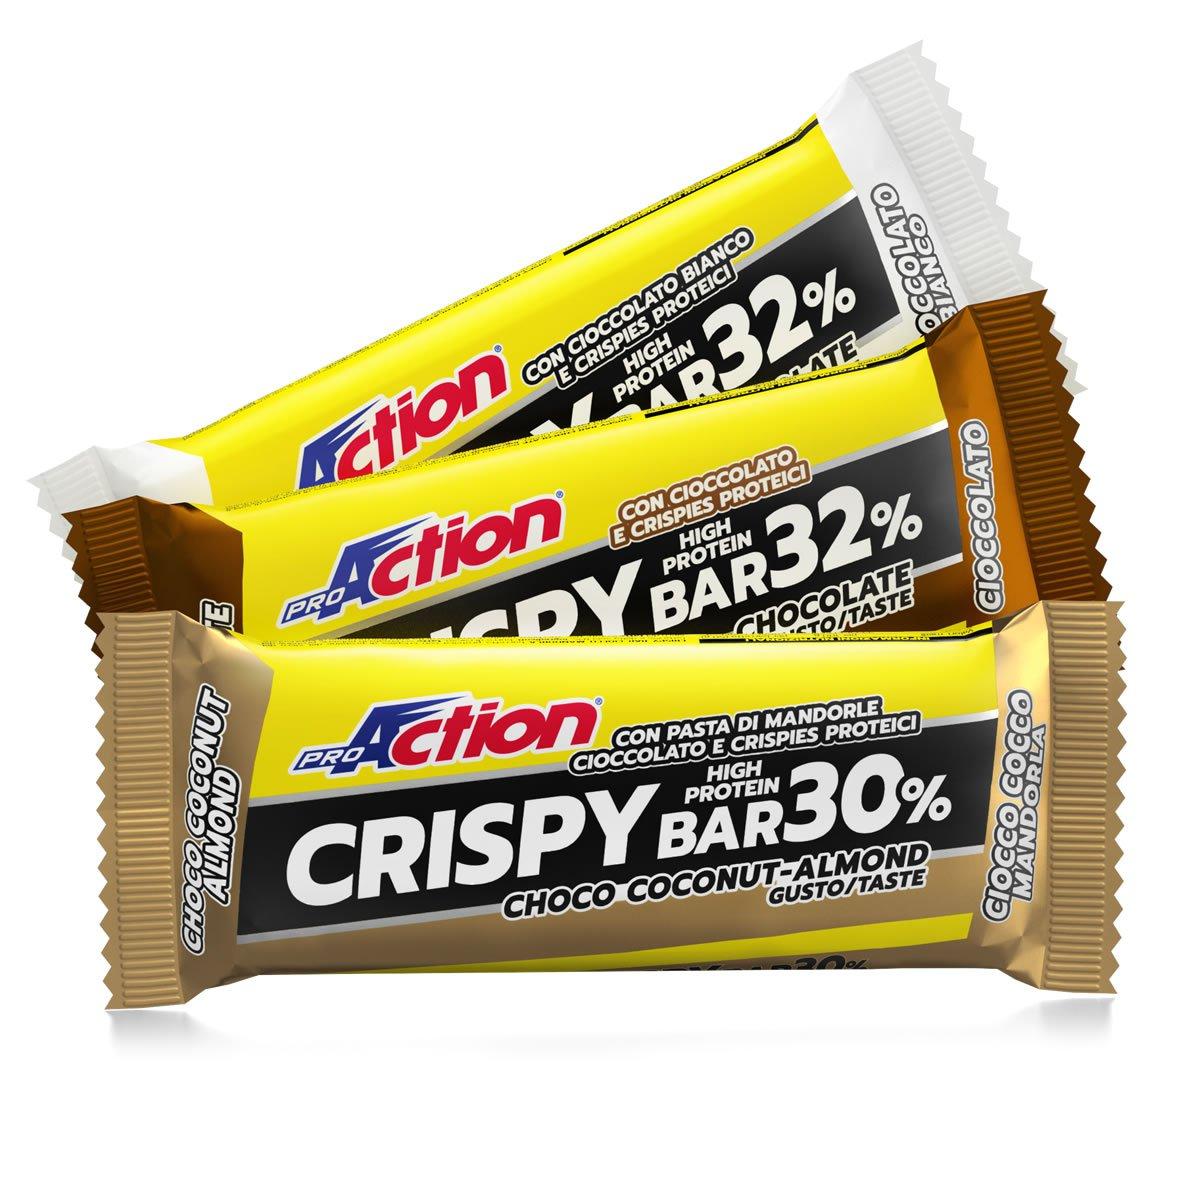 Proaction Crispy Bar 50 G